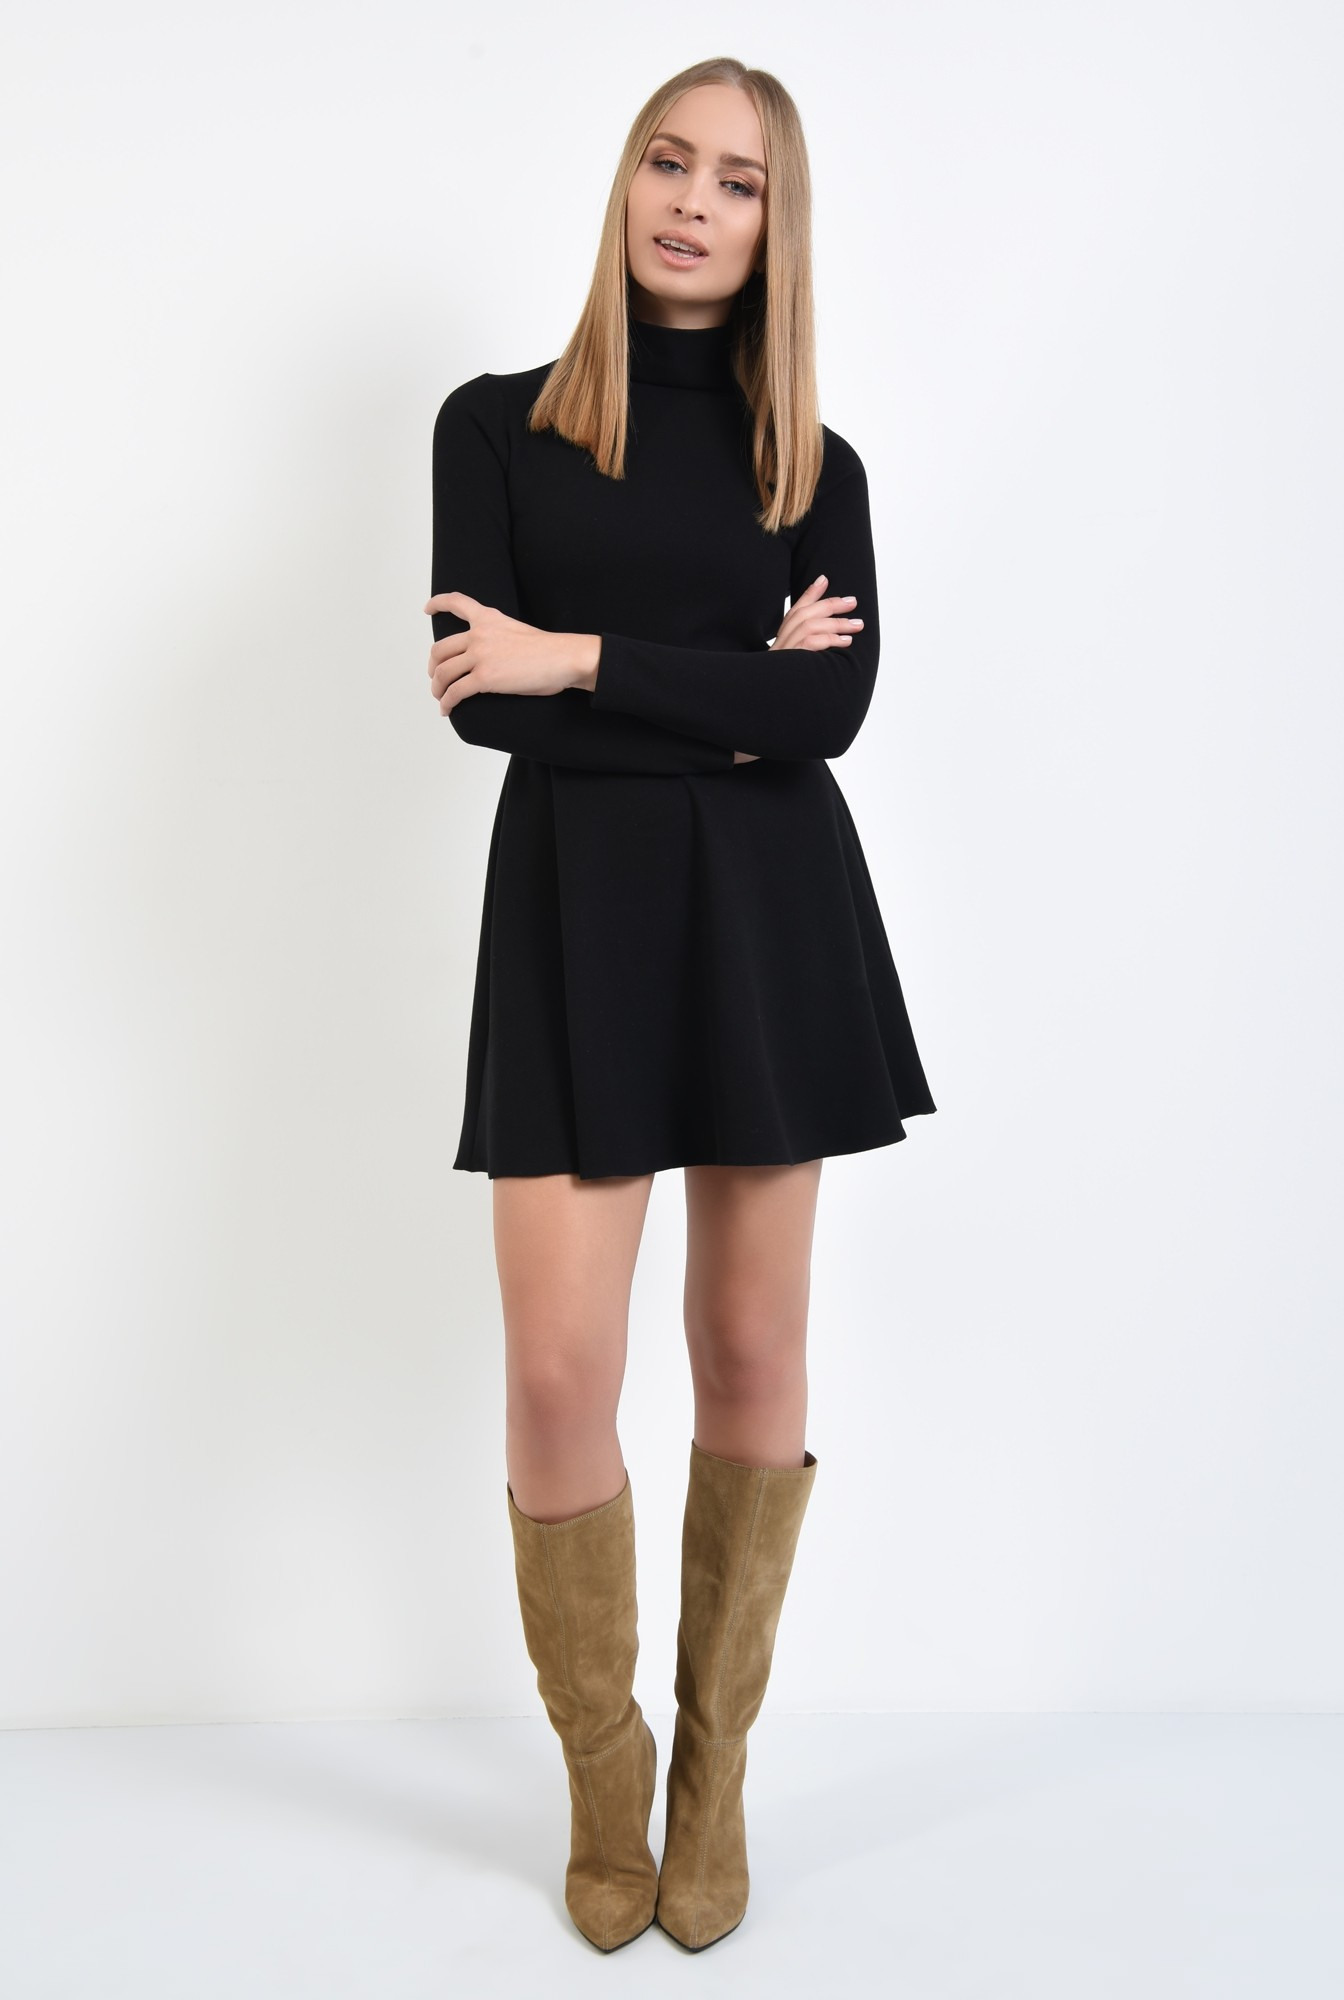 3 - fusta scurta, neagra, tricotata, croi evazat